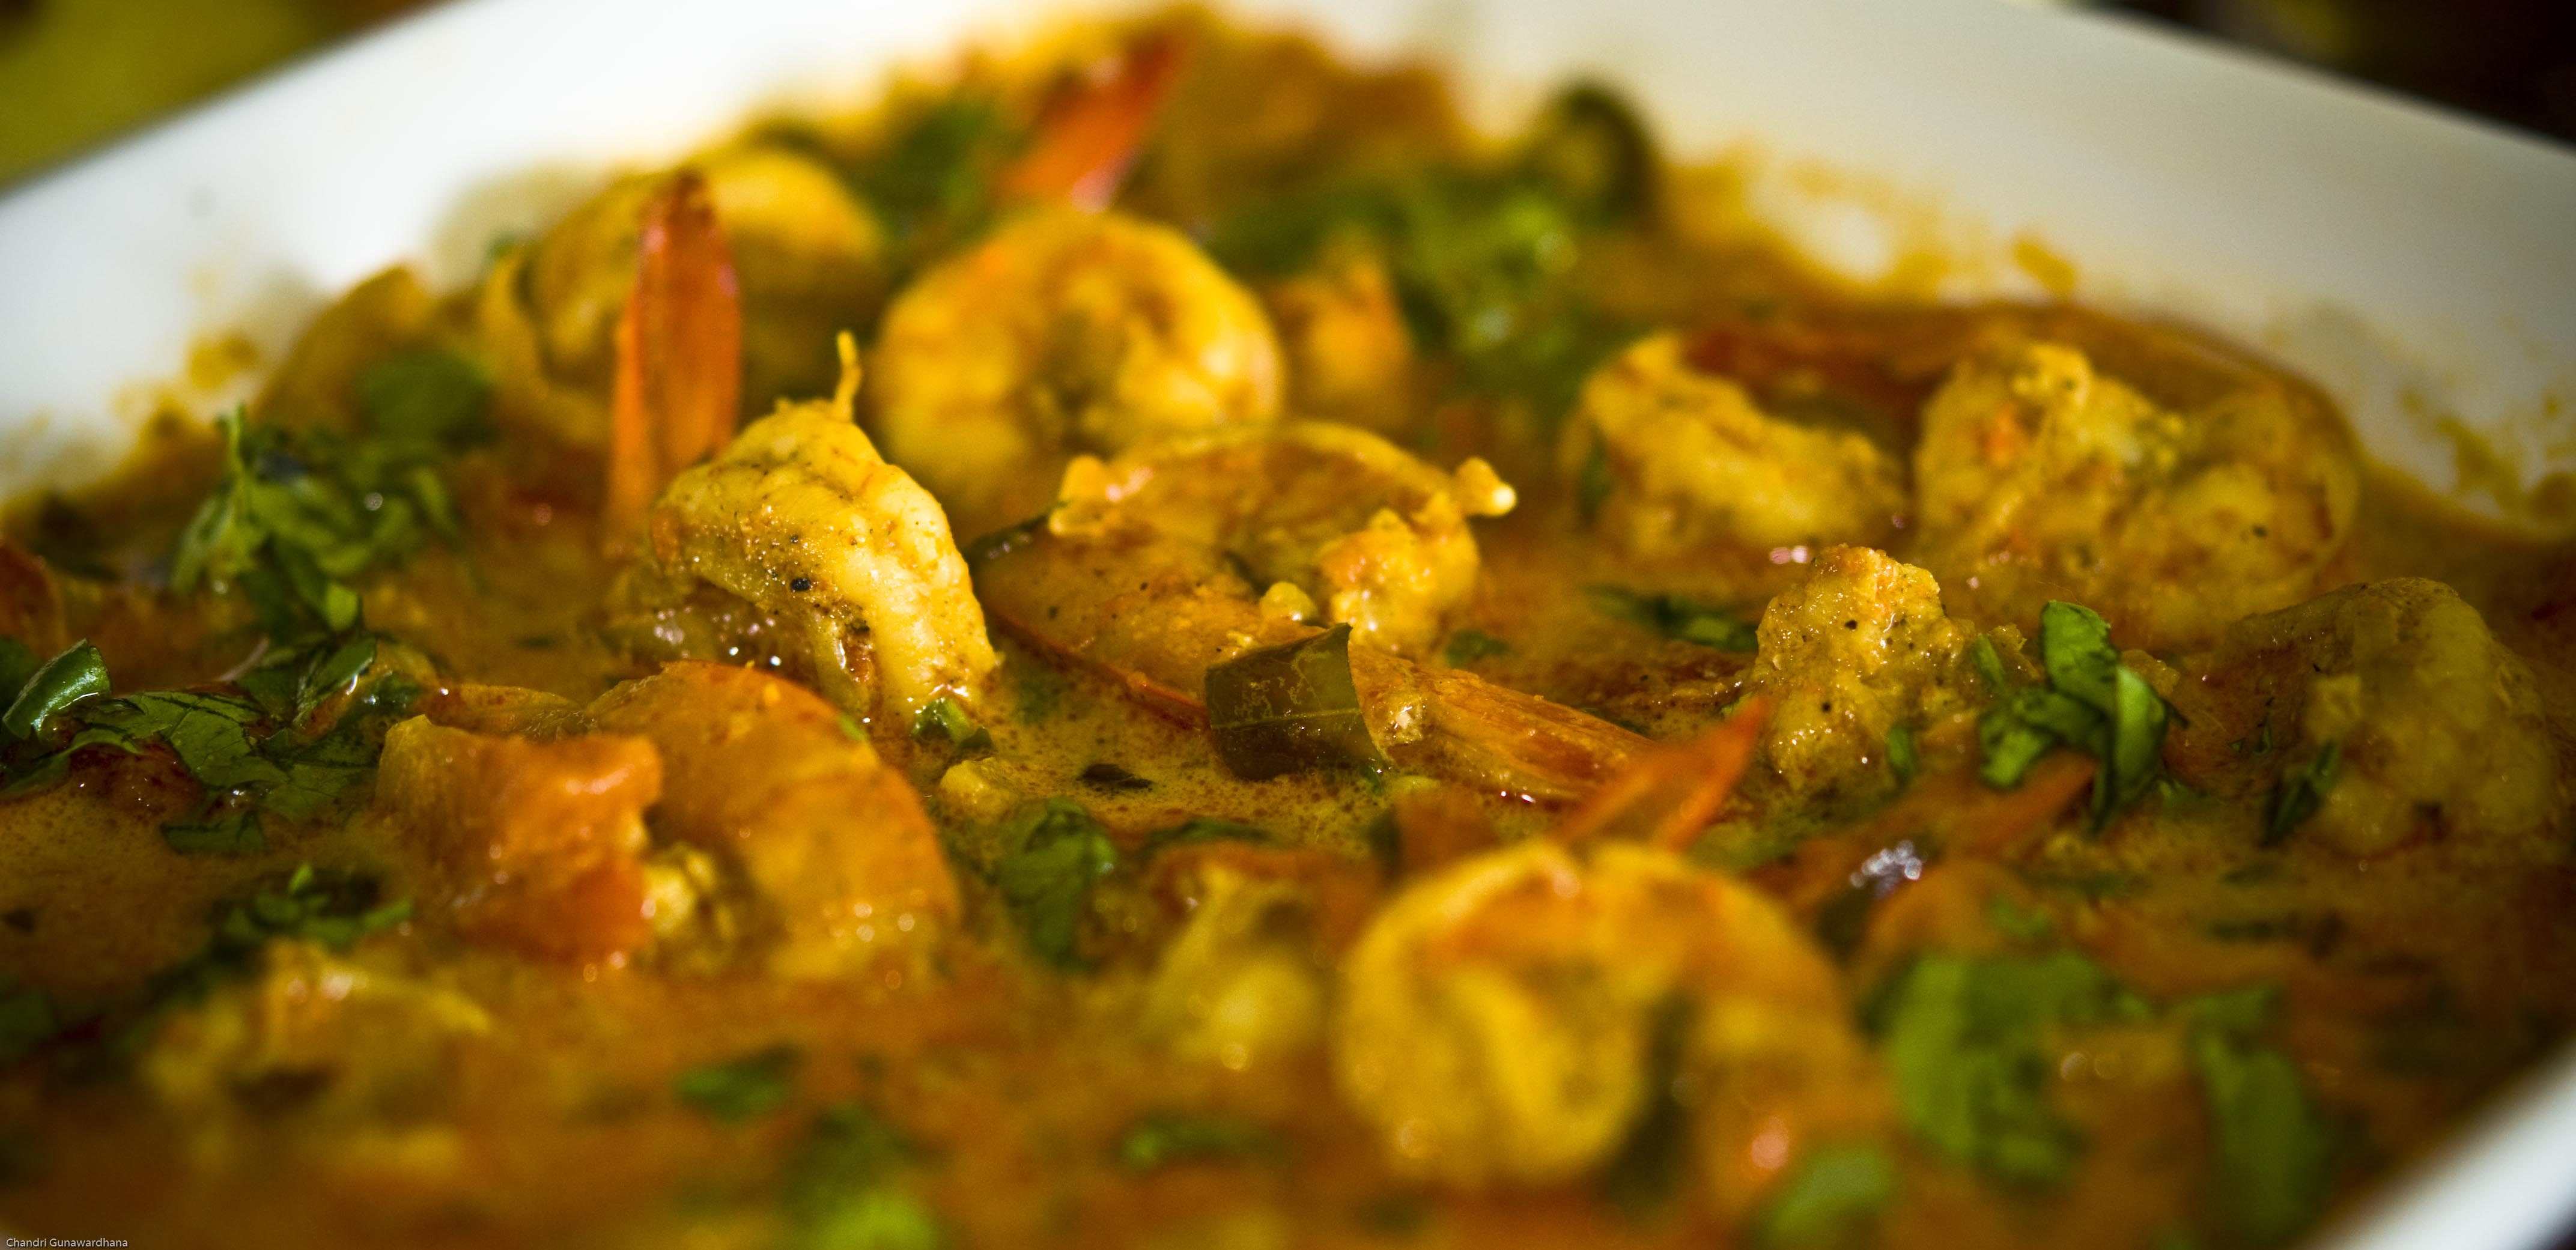 Southern prawn curry sri lankan cuisine flava8 39 s blog for Authentic sri lankan cuisine